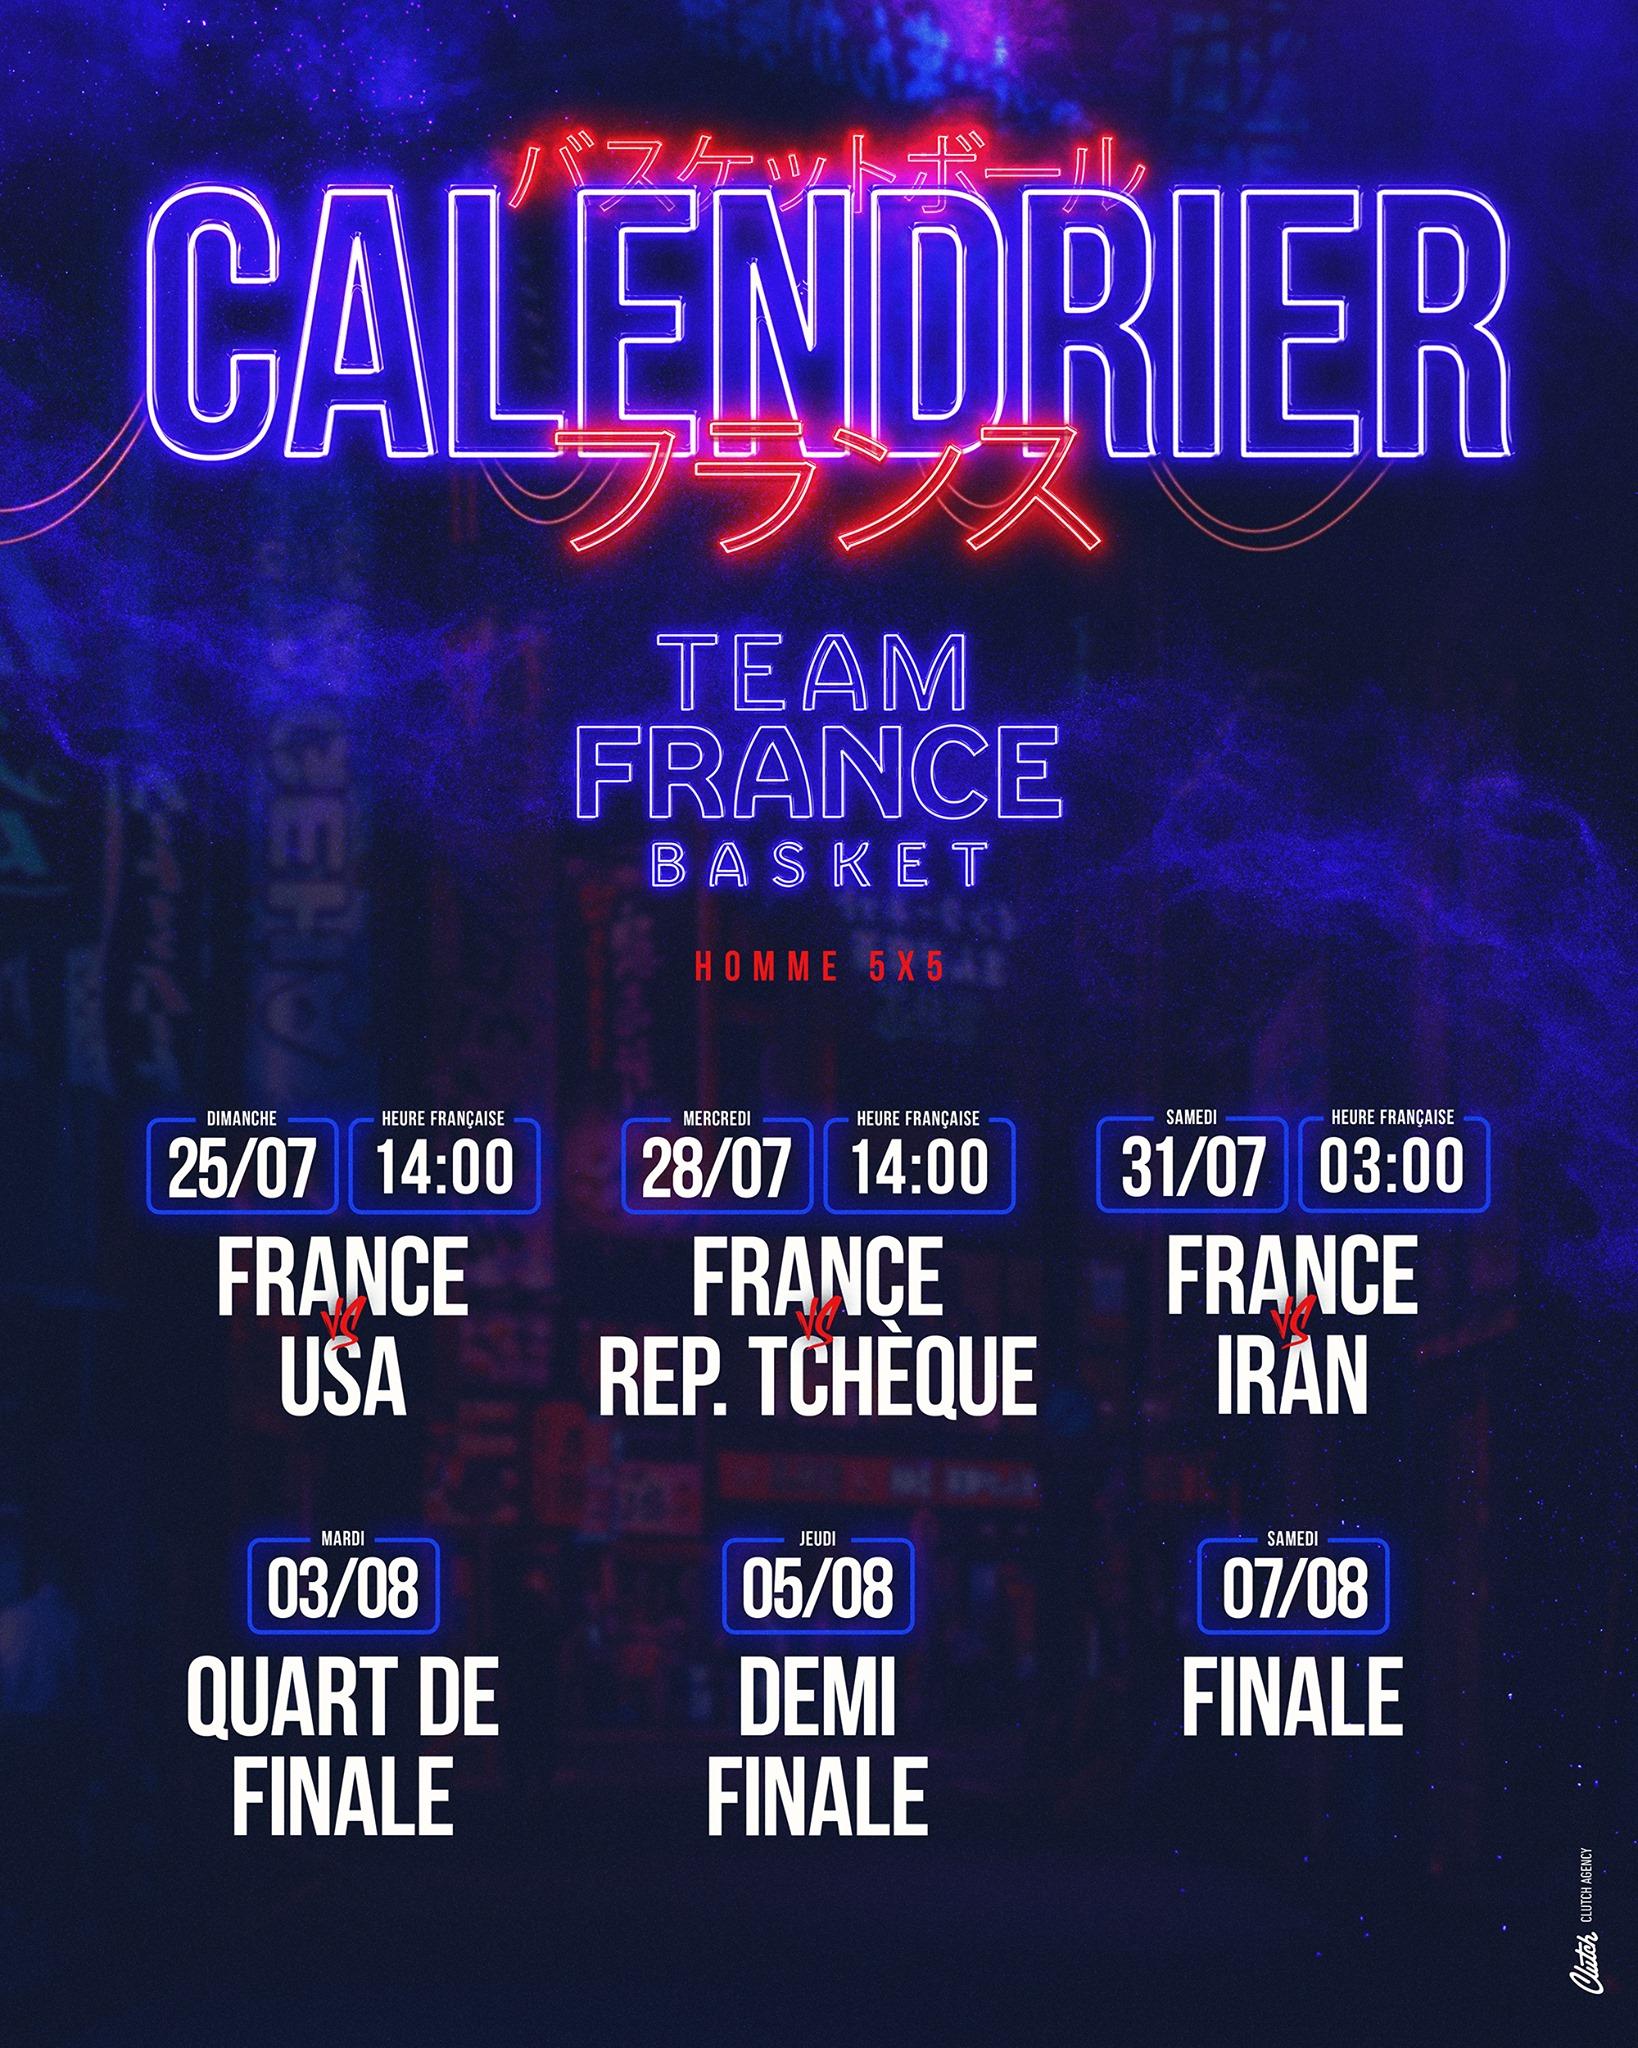 Calendrier Equipe de France masculine